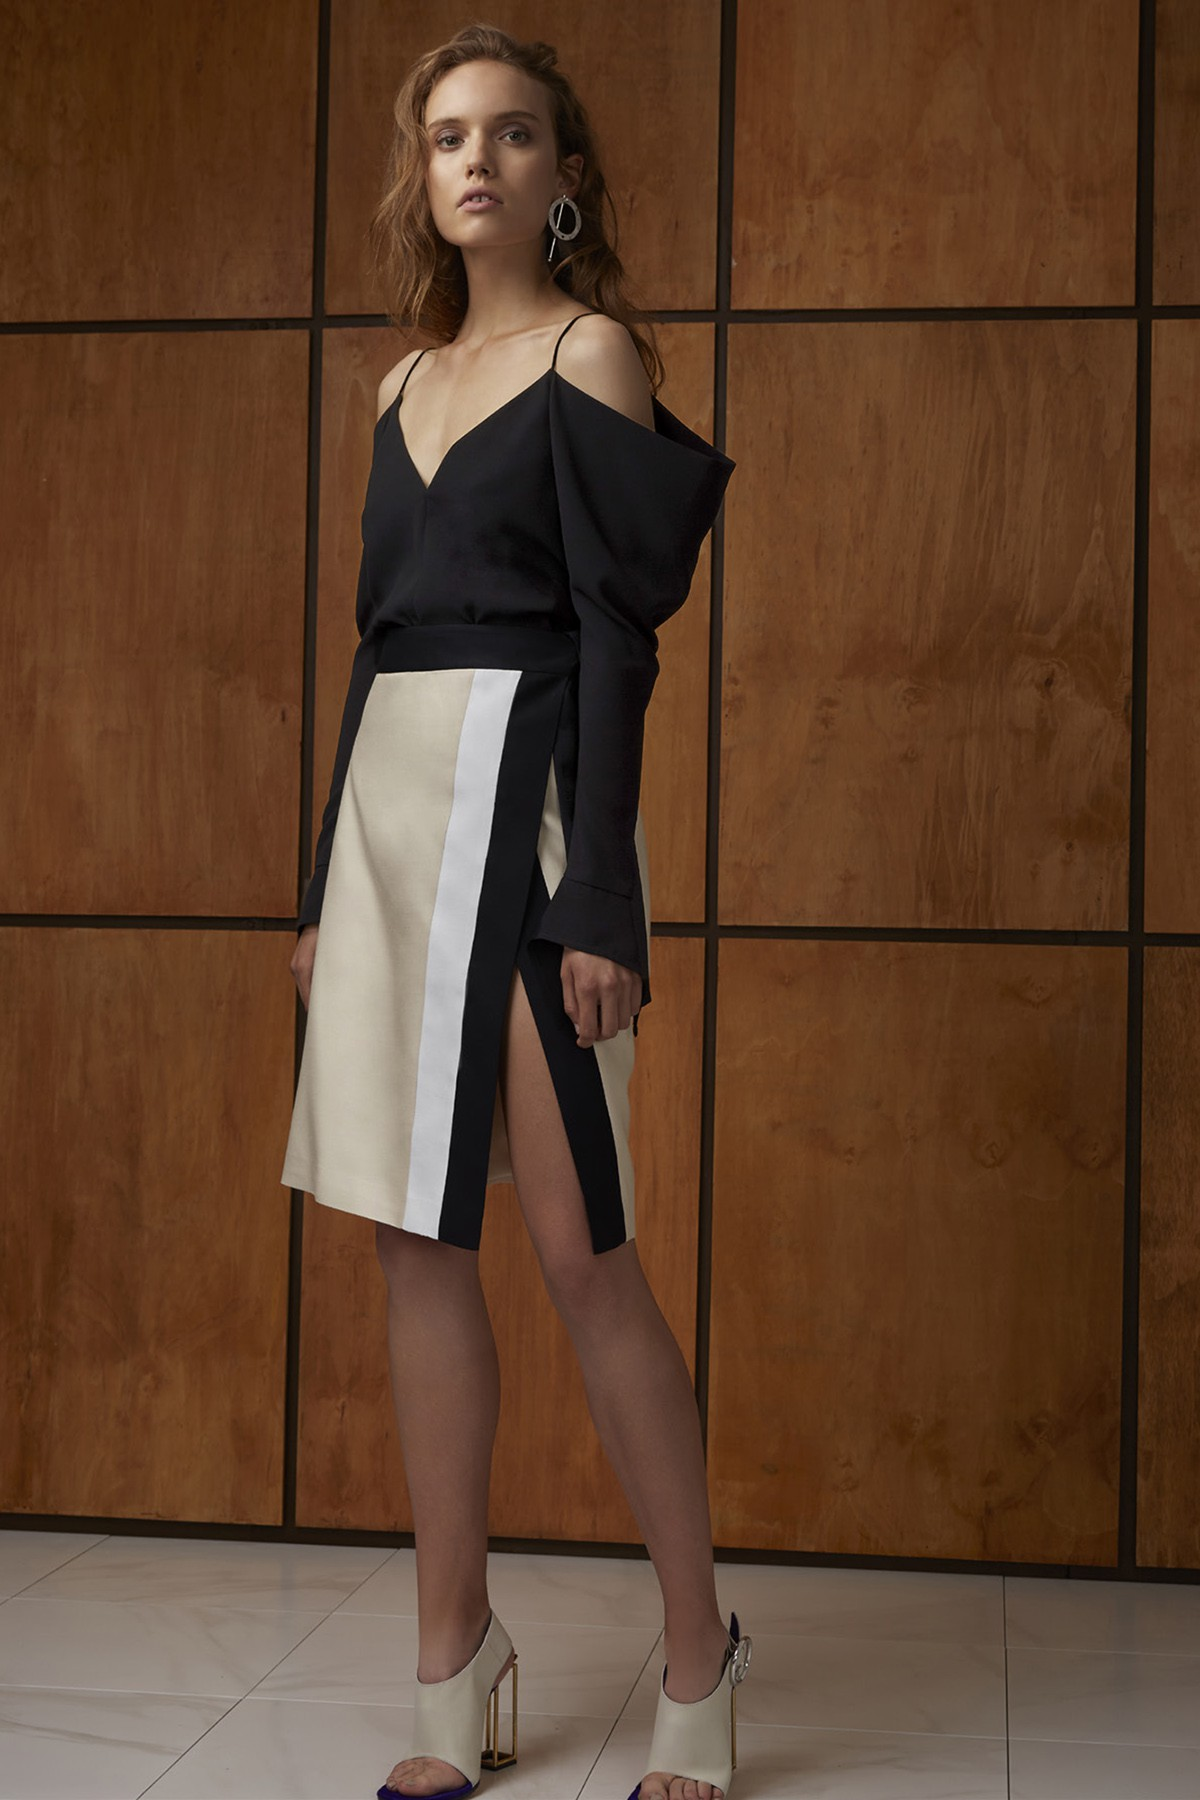 Spaghetti Strap Tops Off Shoulder Long Sleeve Sexy Shirt Patchwork Split Elegant Skirt Fashion High Quality